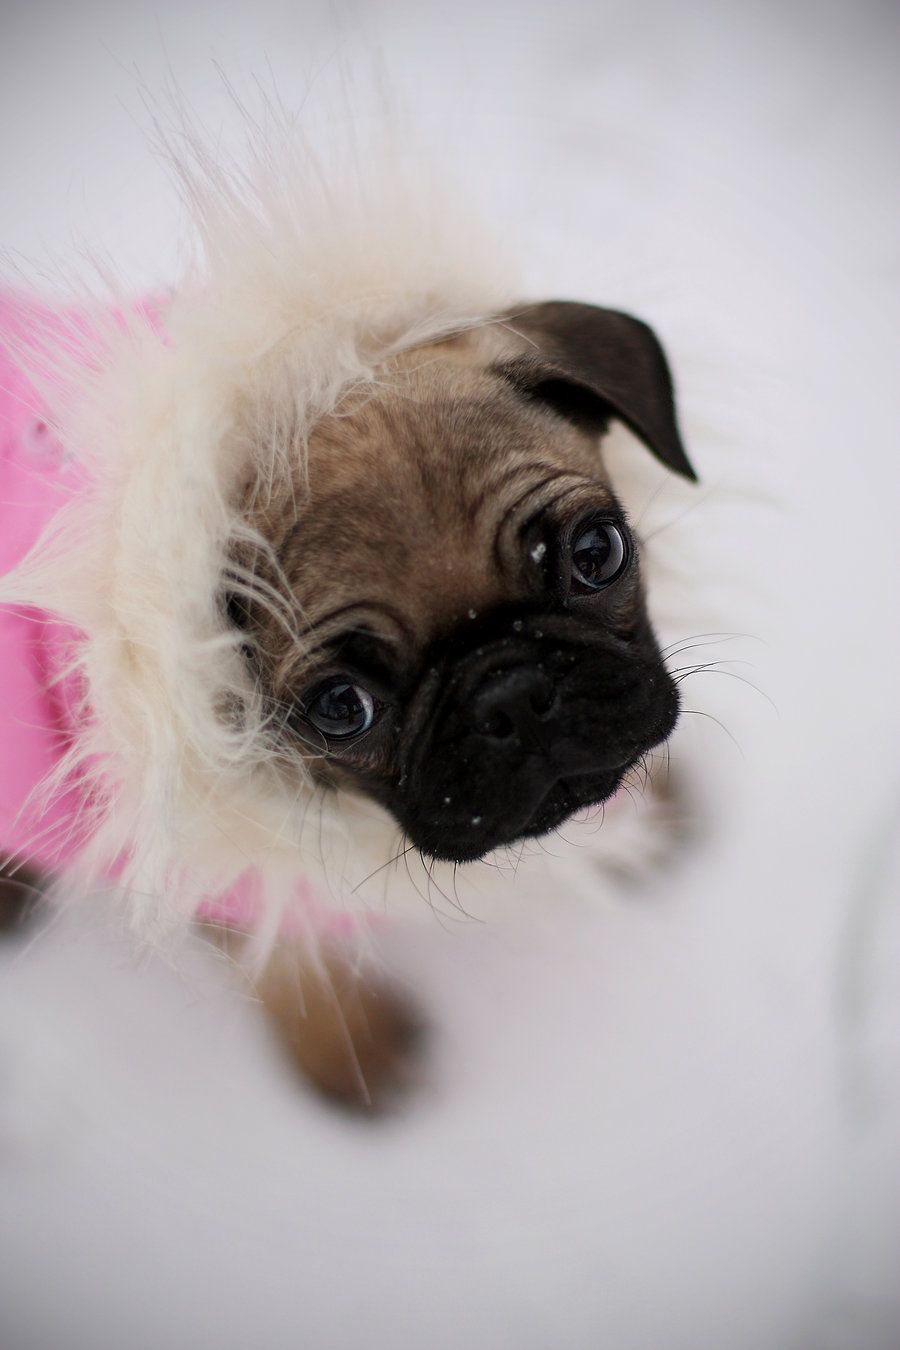 pug wallpaper, screensaver, background cute pug puppy | pug